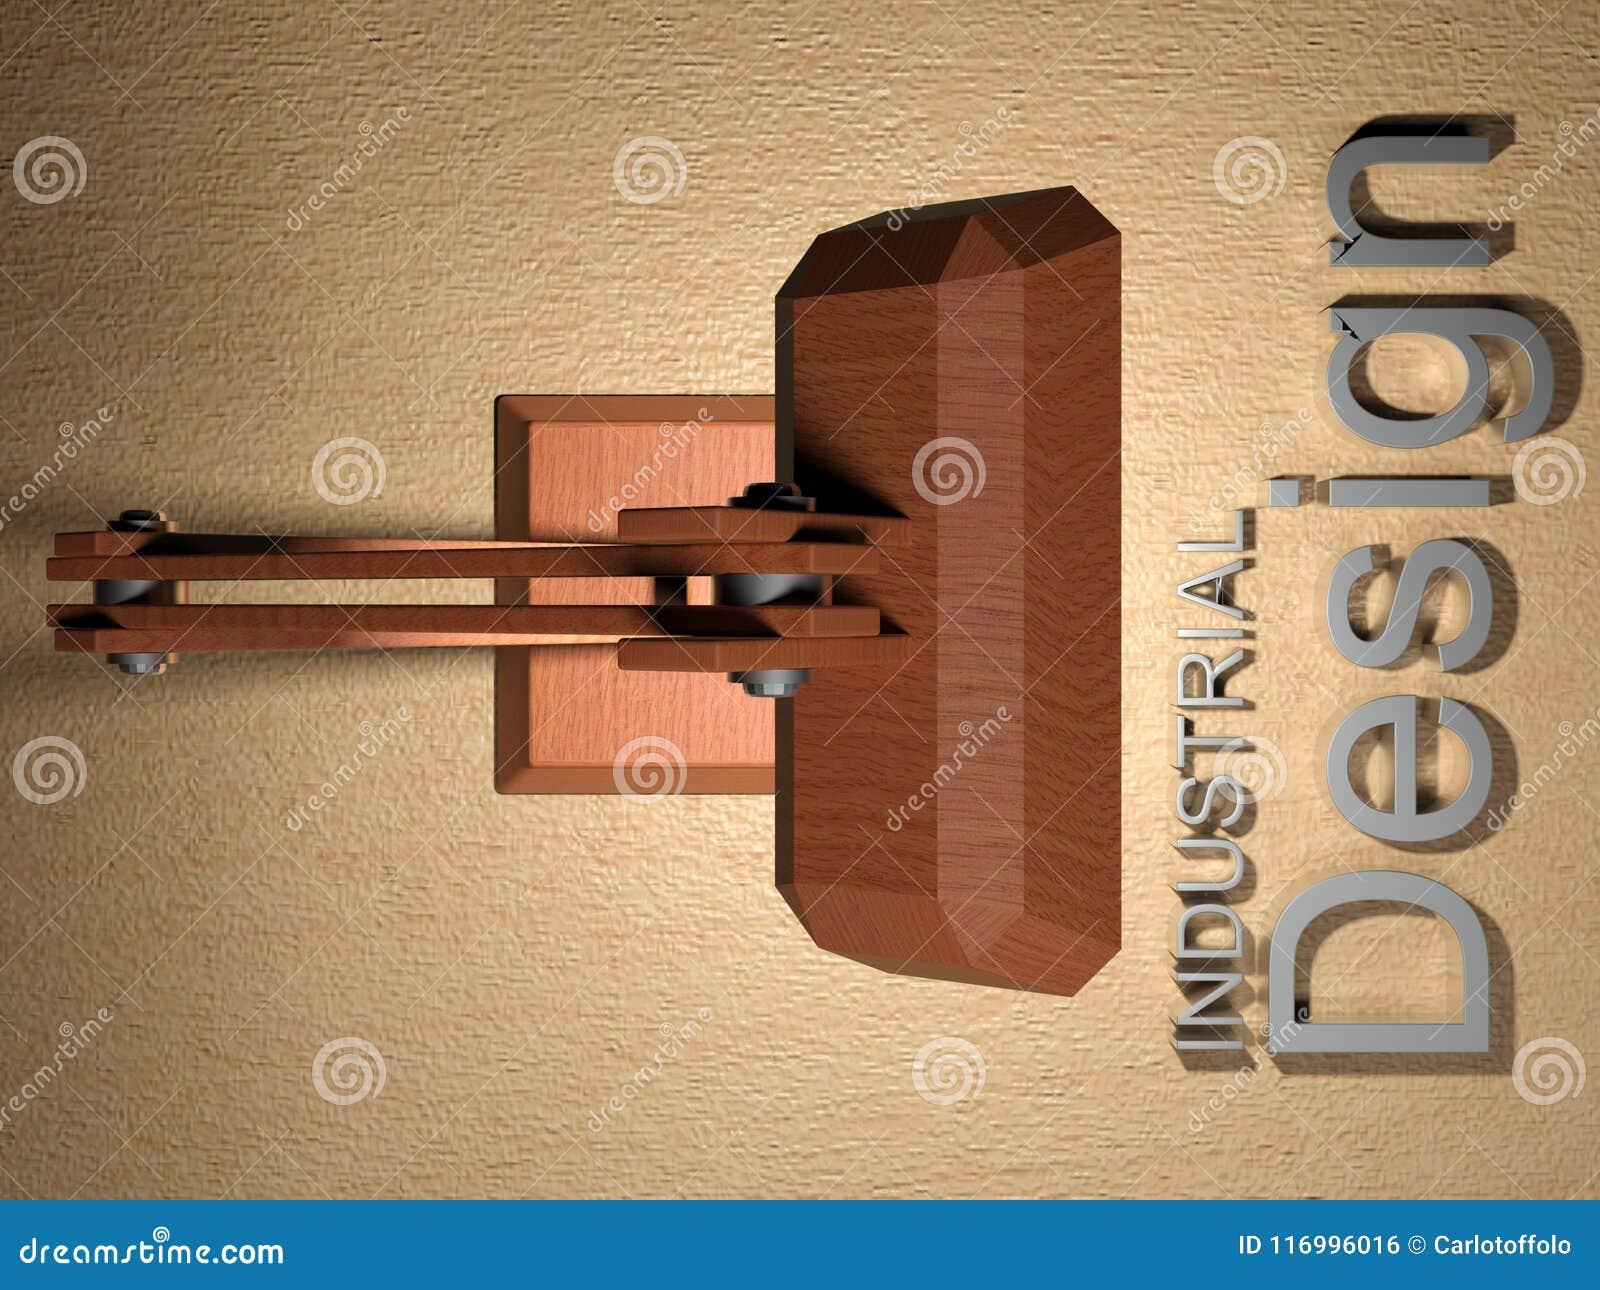 Industrial Design With Wooden Desk Lamp 3d Rendering Stock Illustration Illustration Of Idea Lamp 116996016